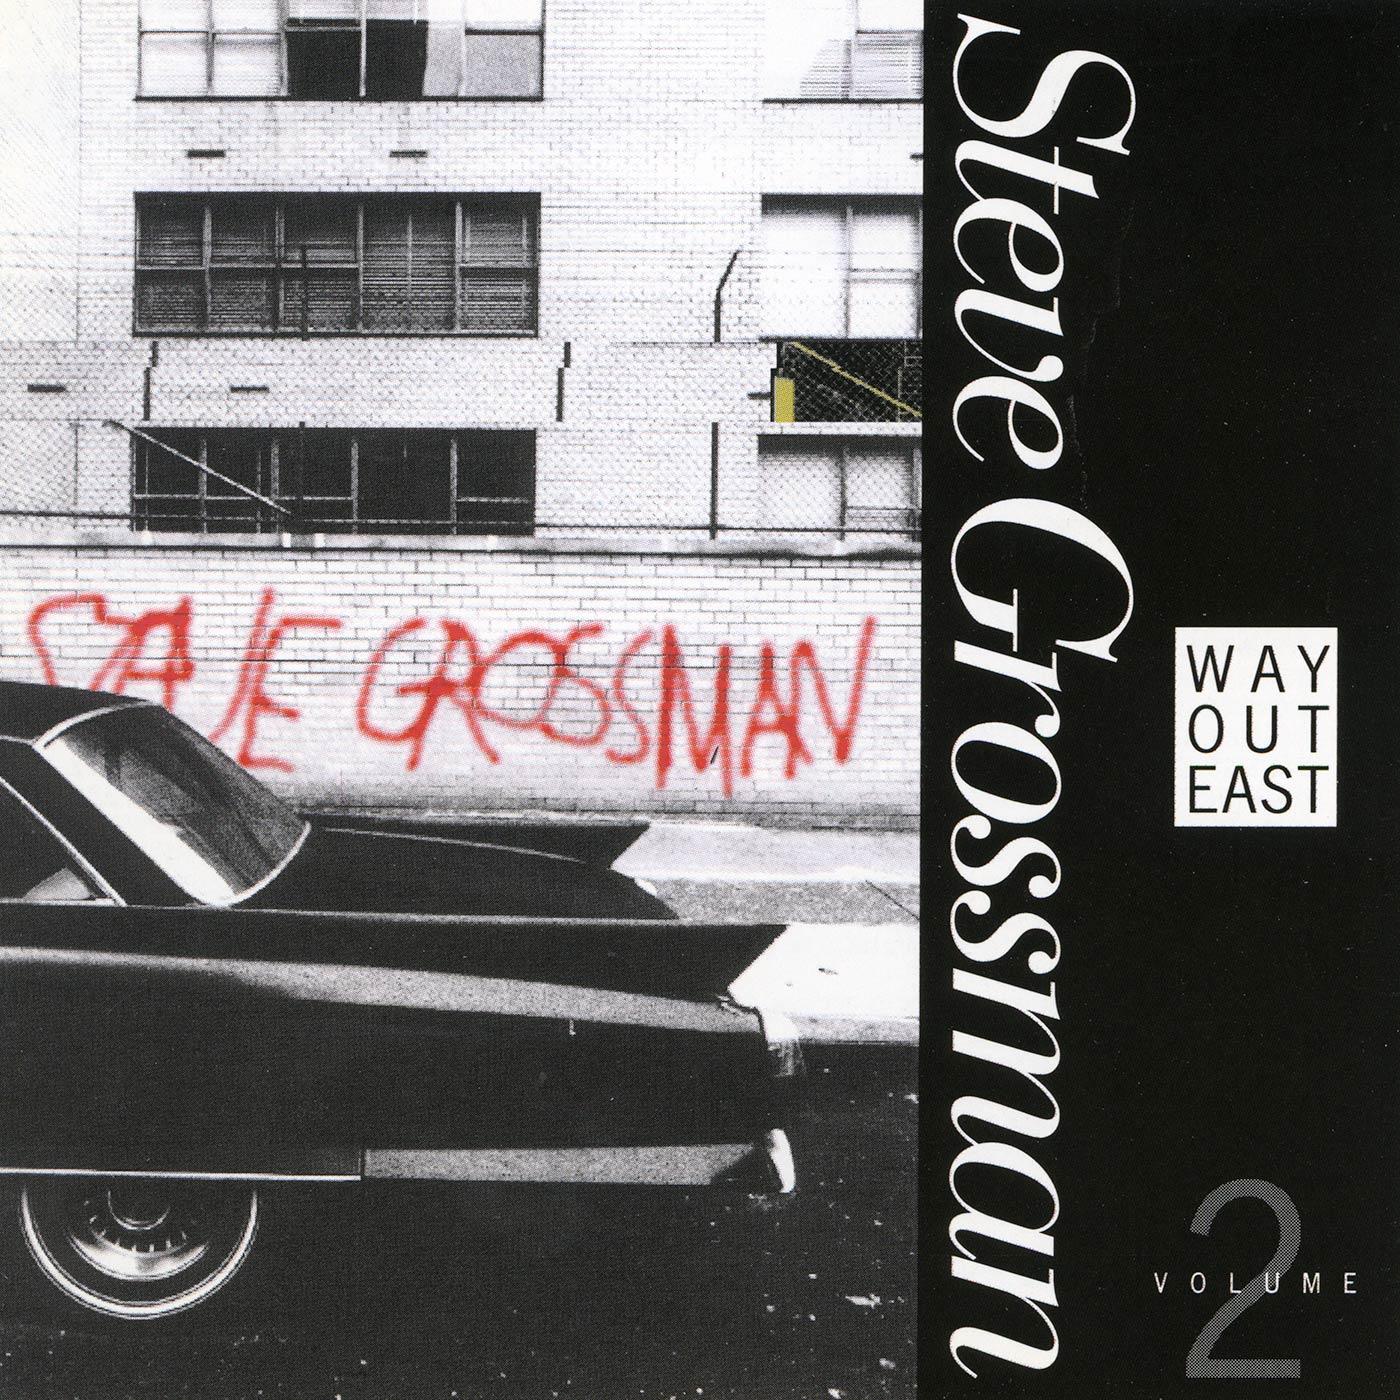 Way Out East - Vol. 2 - Steve Grossman